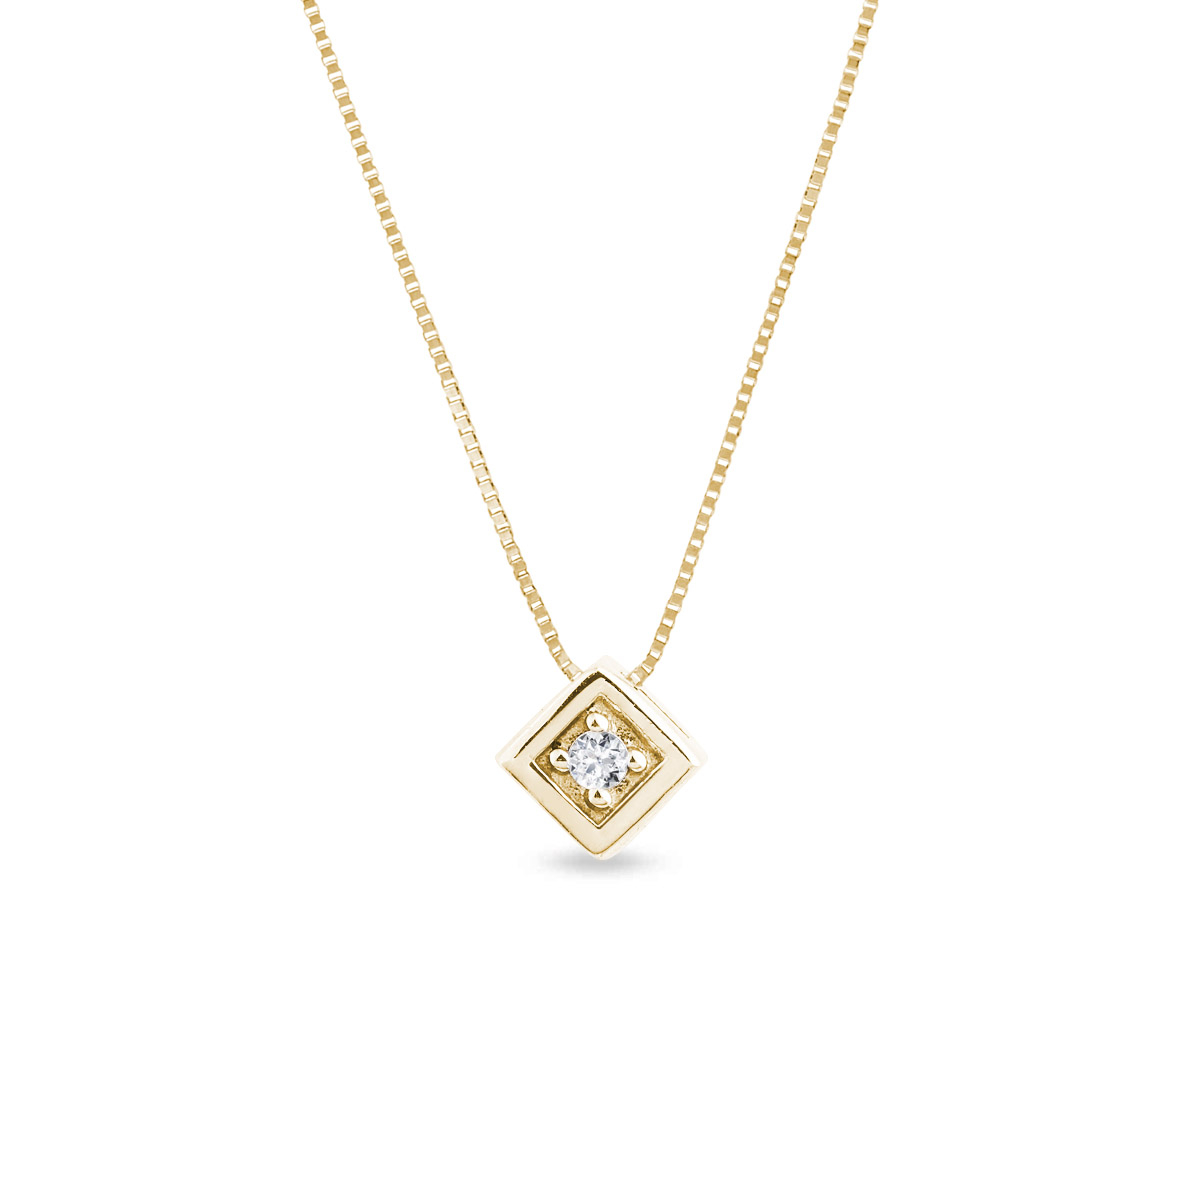 https://www.klenota.co.uk/Diamond-Pendants/Diamond-necklace-13139